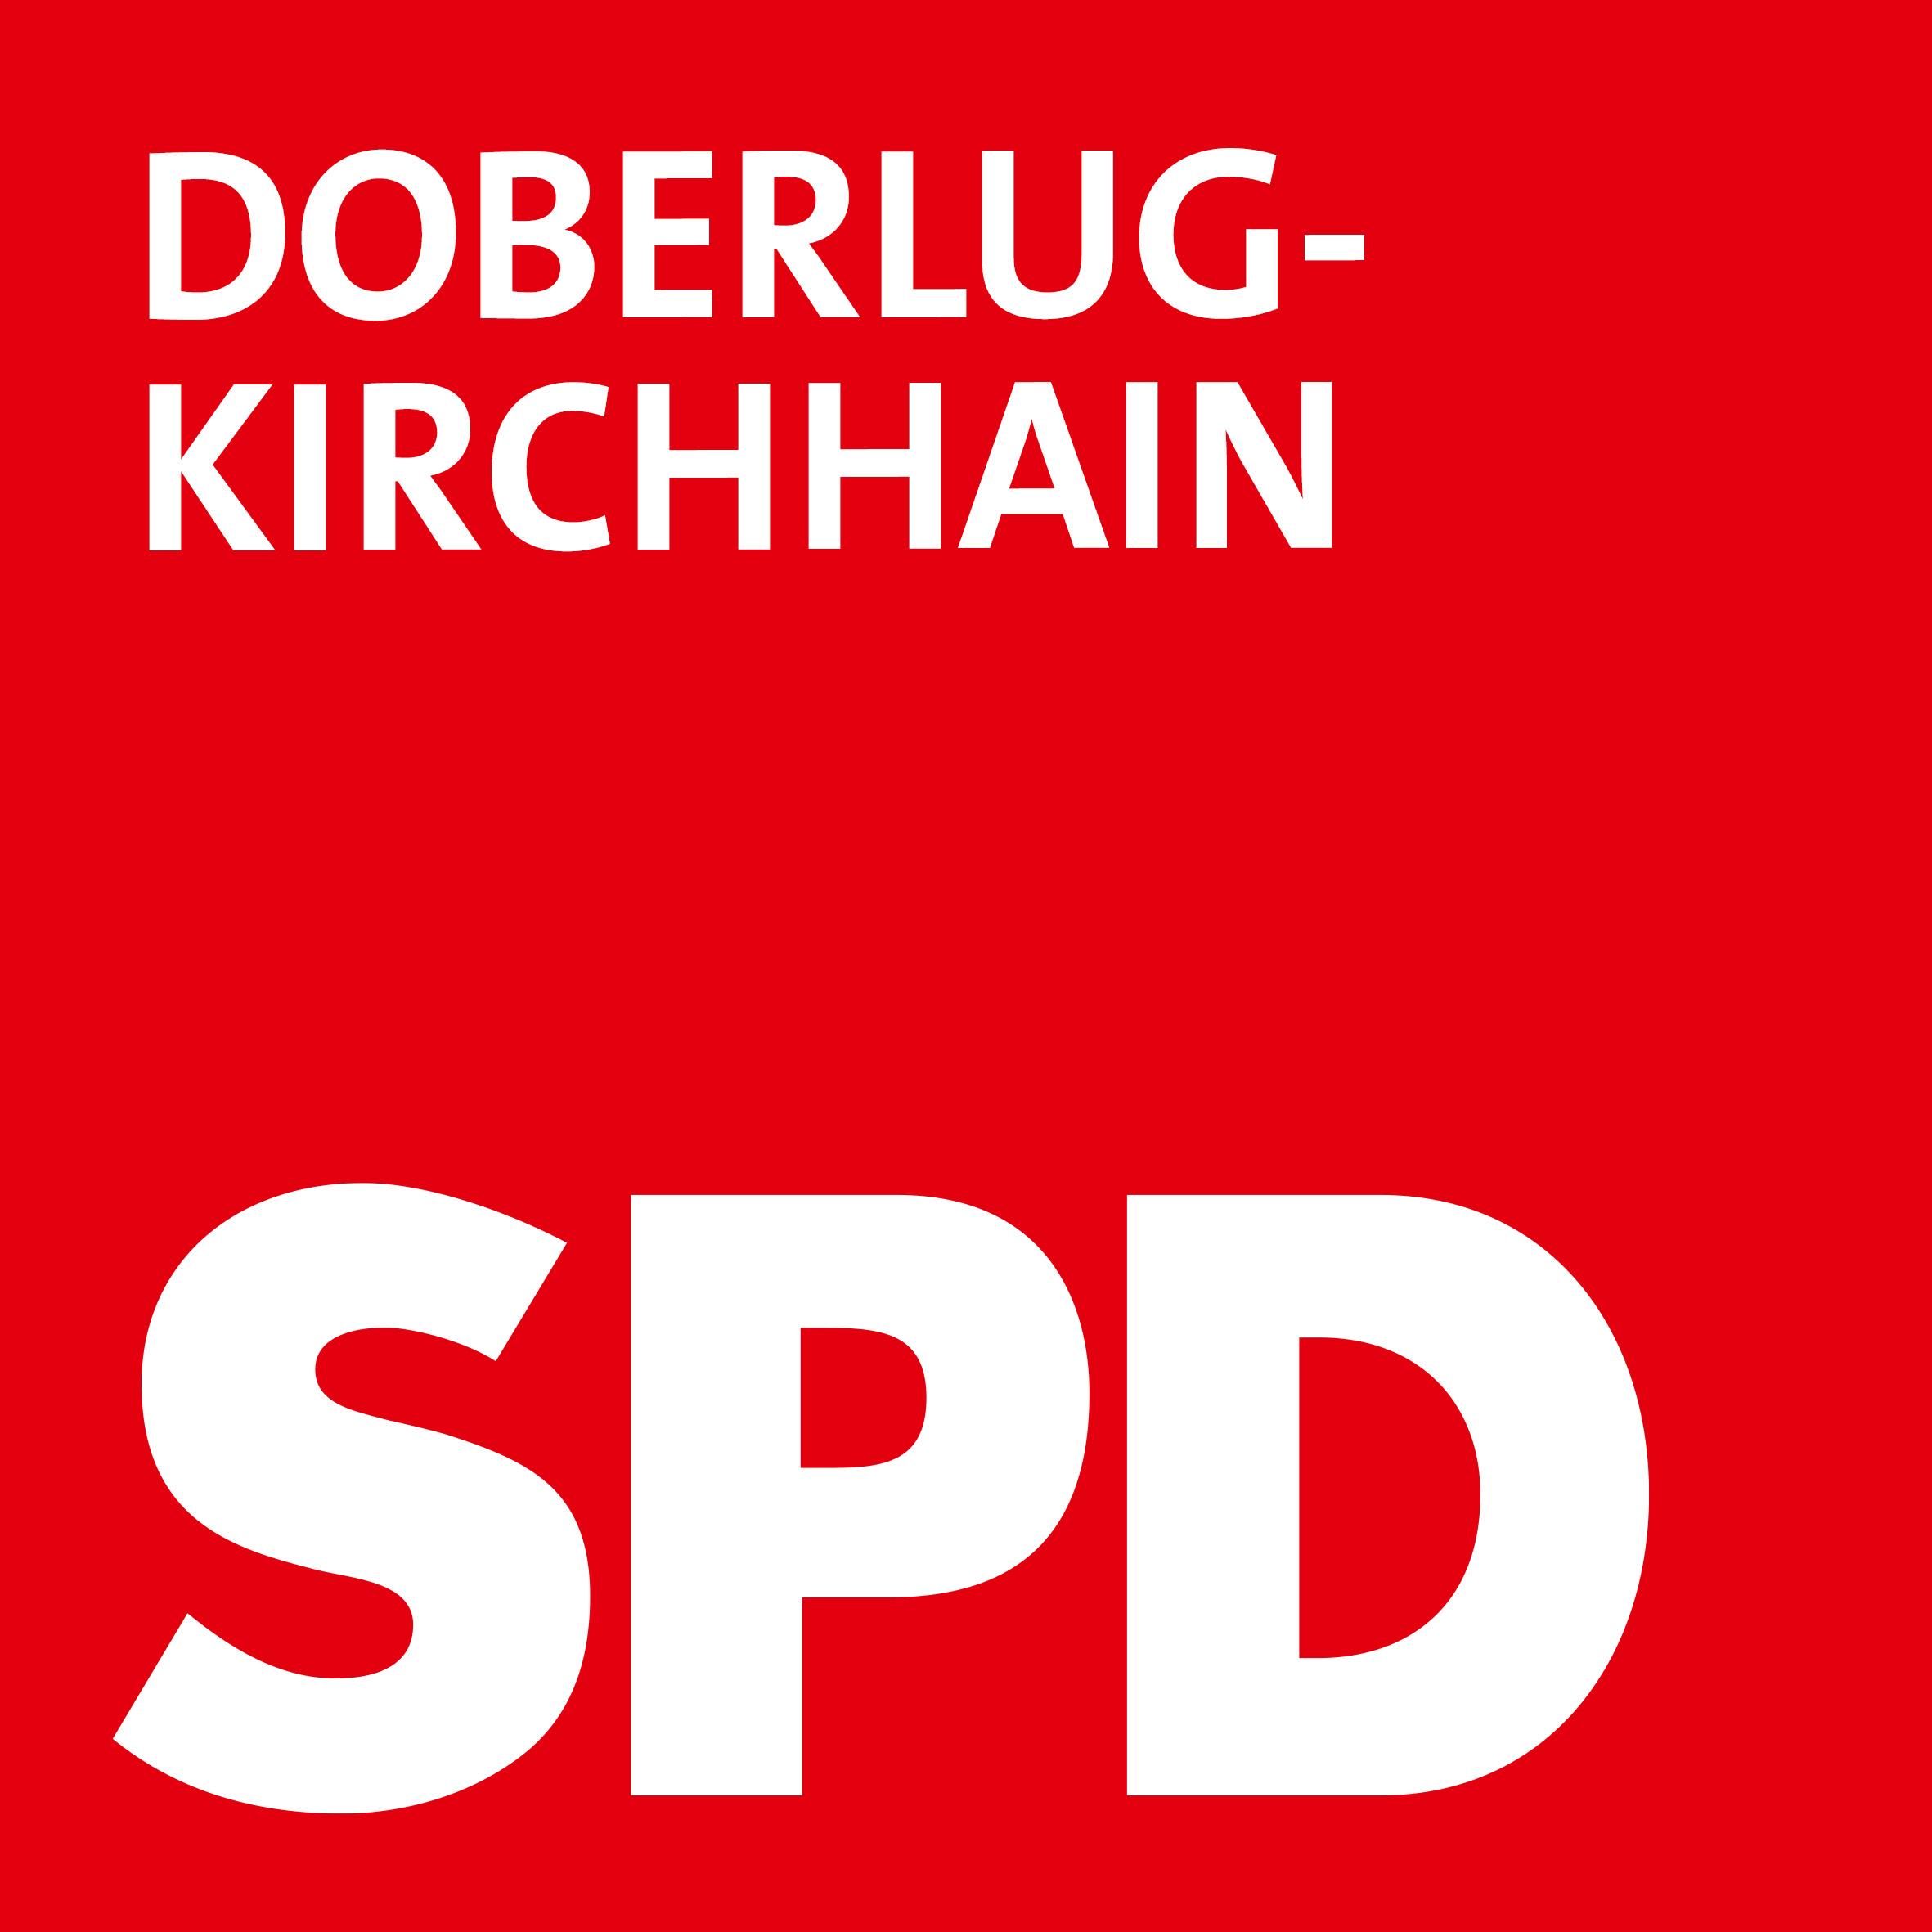 SPD Doberlug-Kirchhain